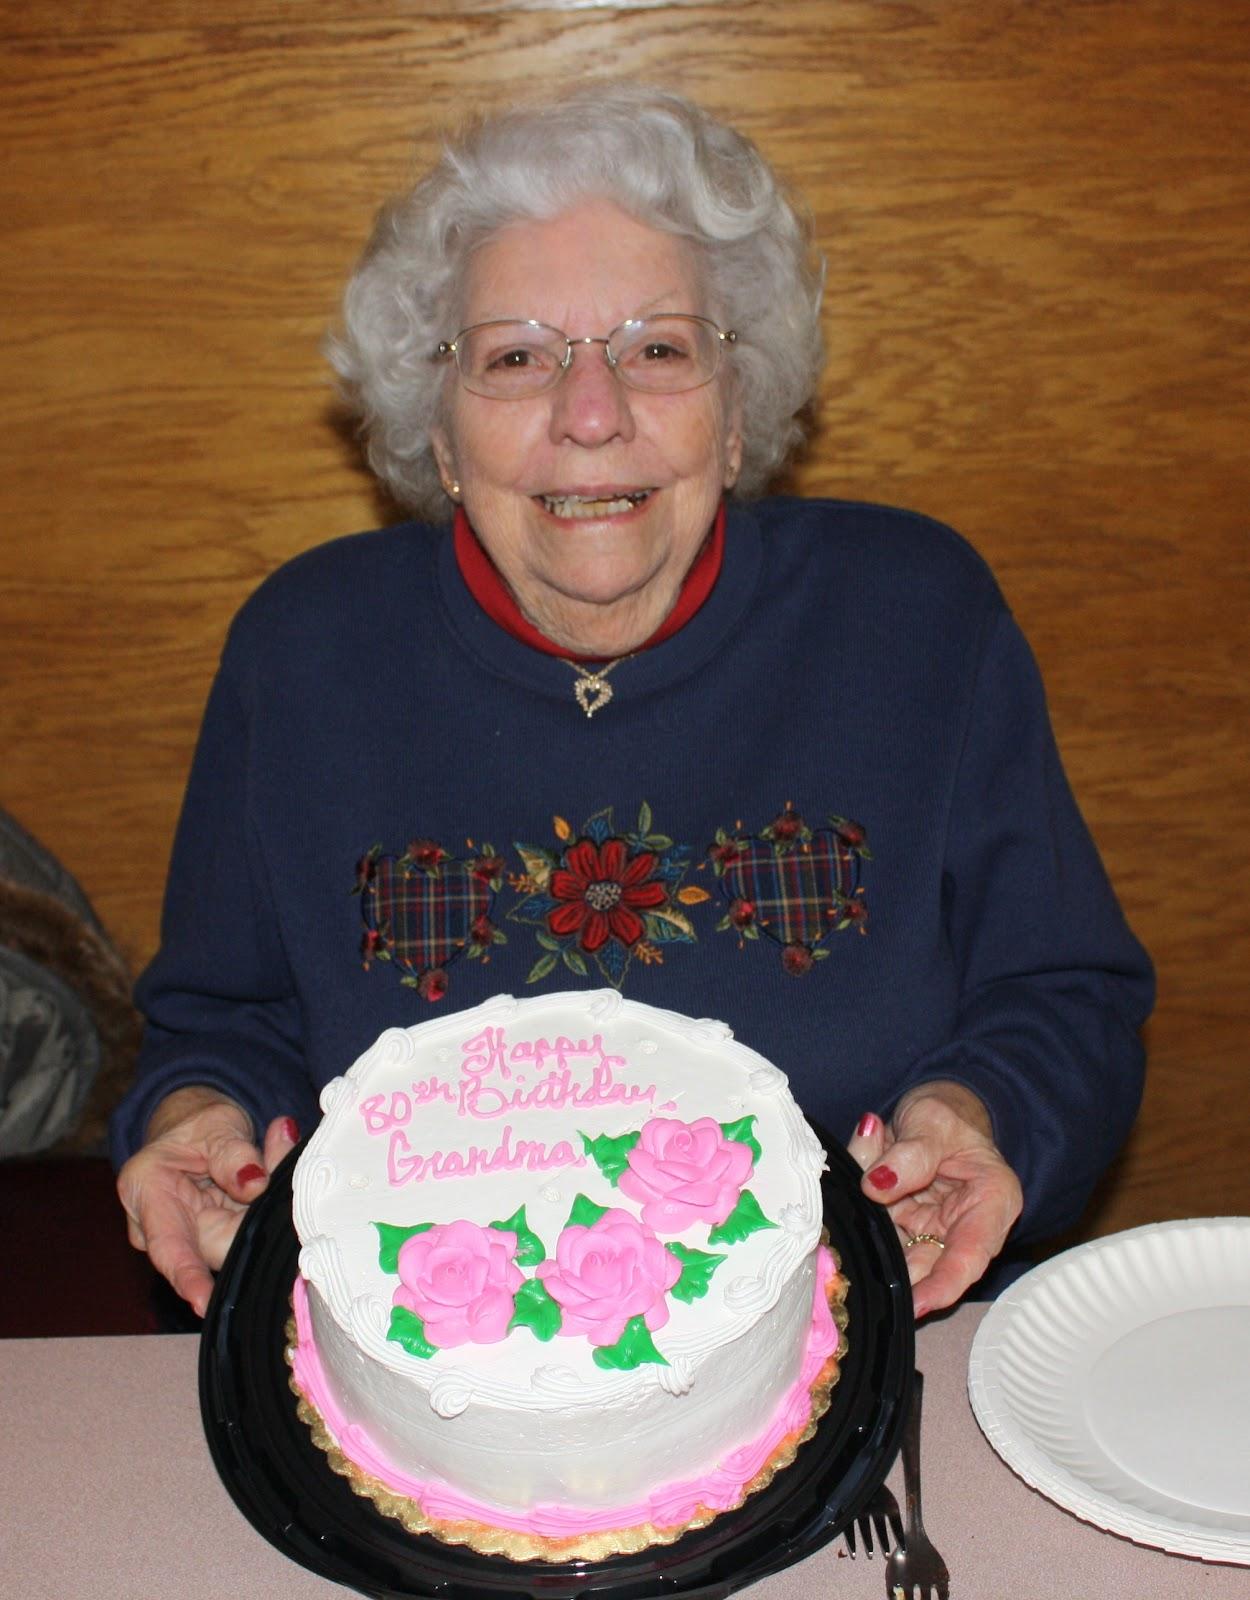 The Crooked Pear Happy Birthday Grandma